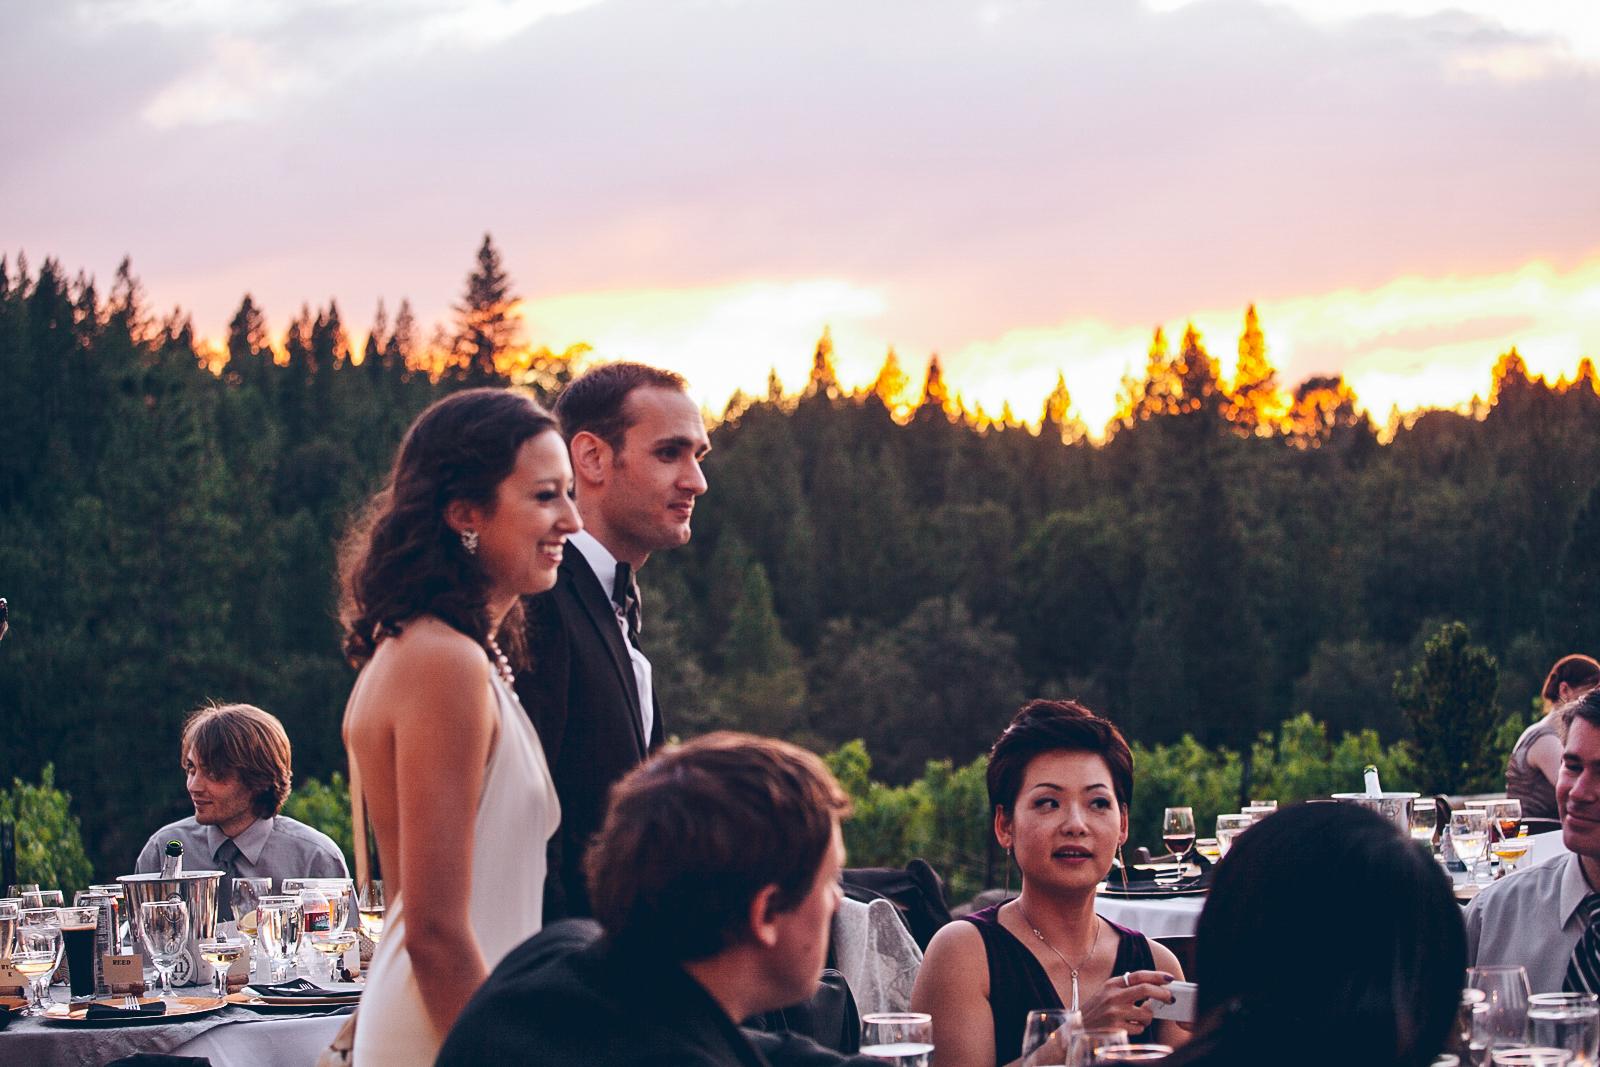 miraflores_winery_wedding_photography_ian_melissa_ebony_siovhan_bokeh_photography_71.jpg